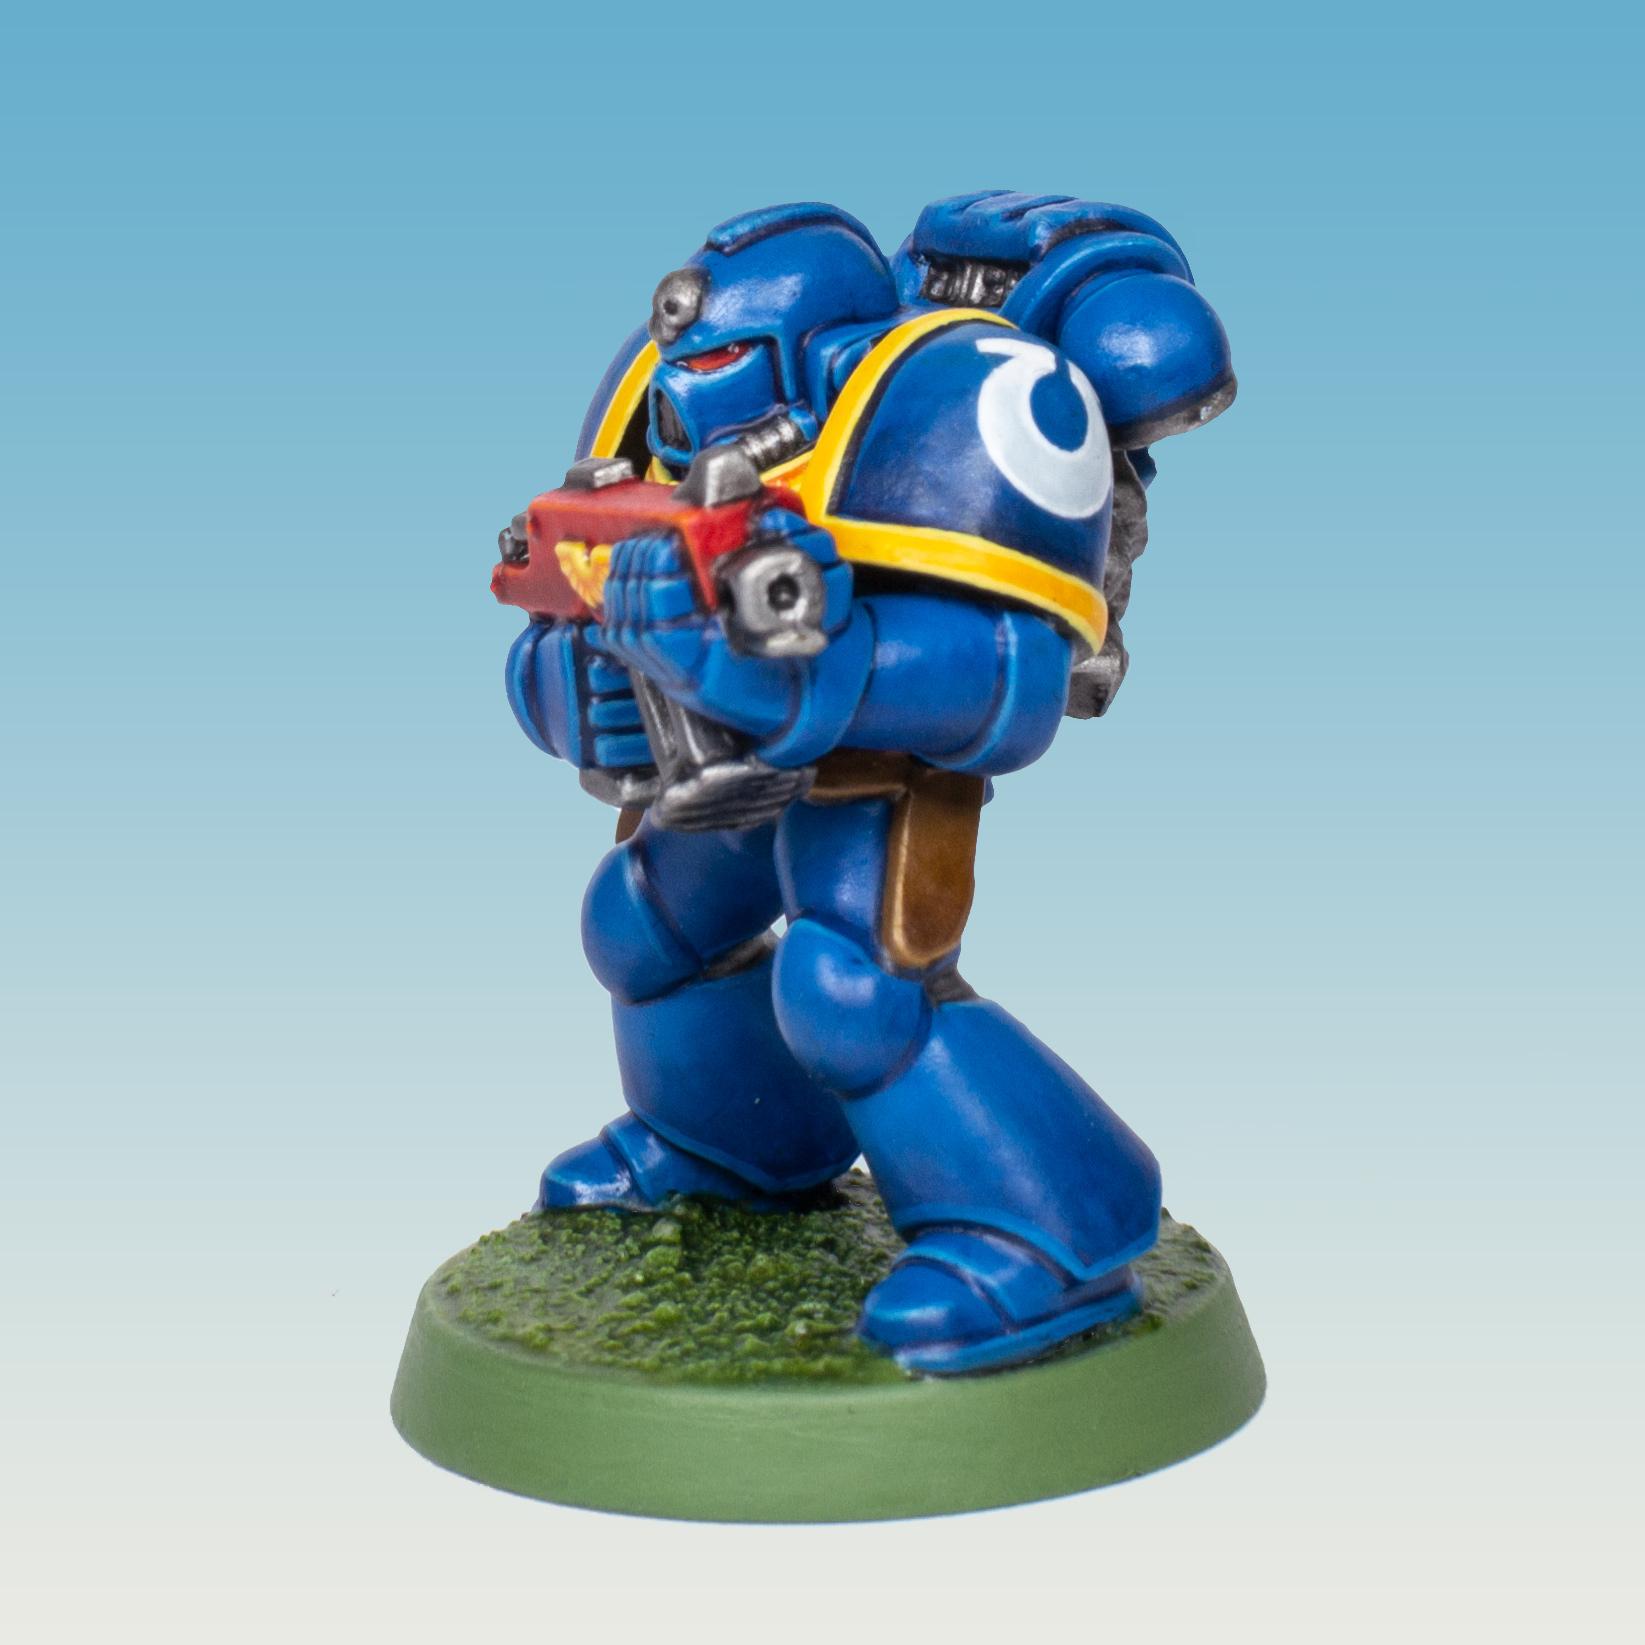 Ultramarine Space Marine from the Warhammer 40.000 2nd Edition starter set